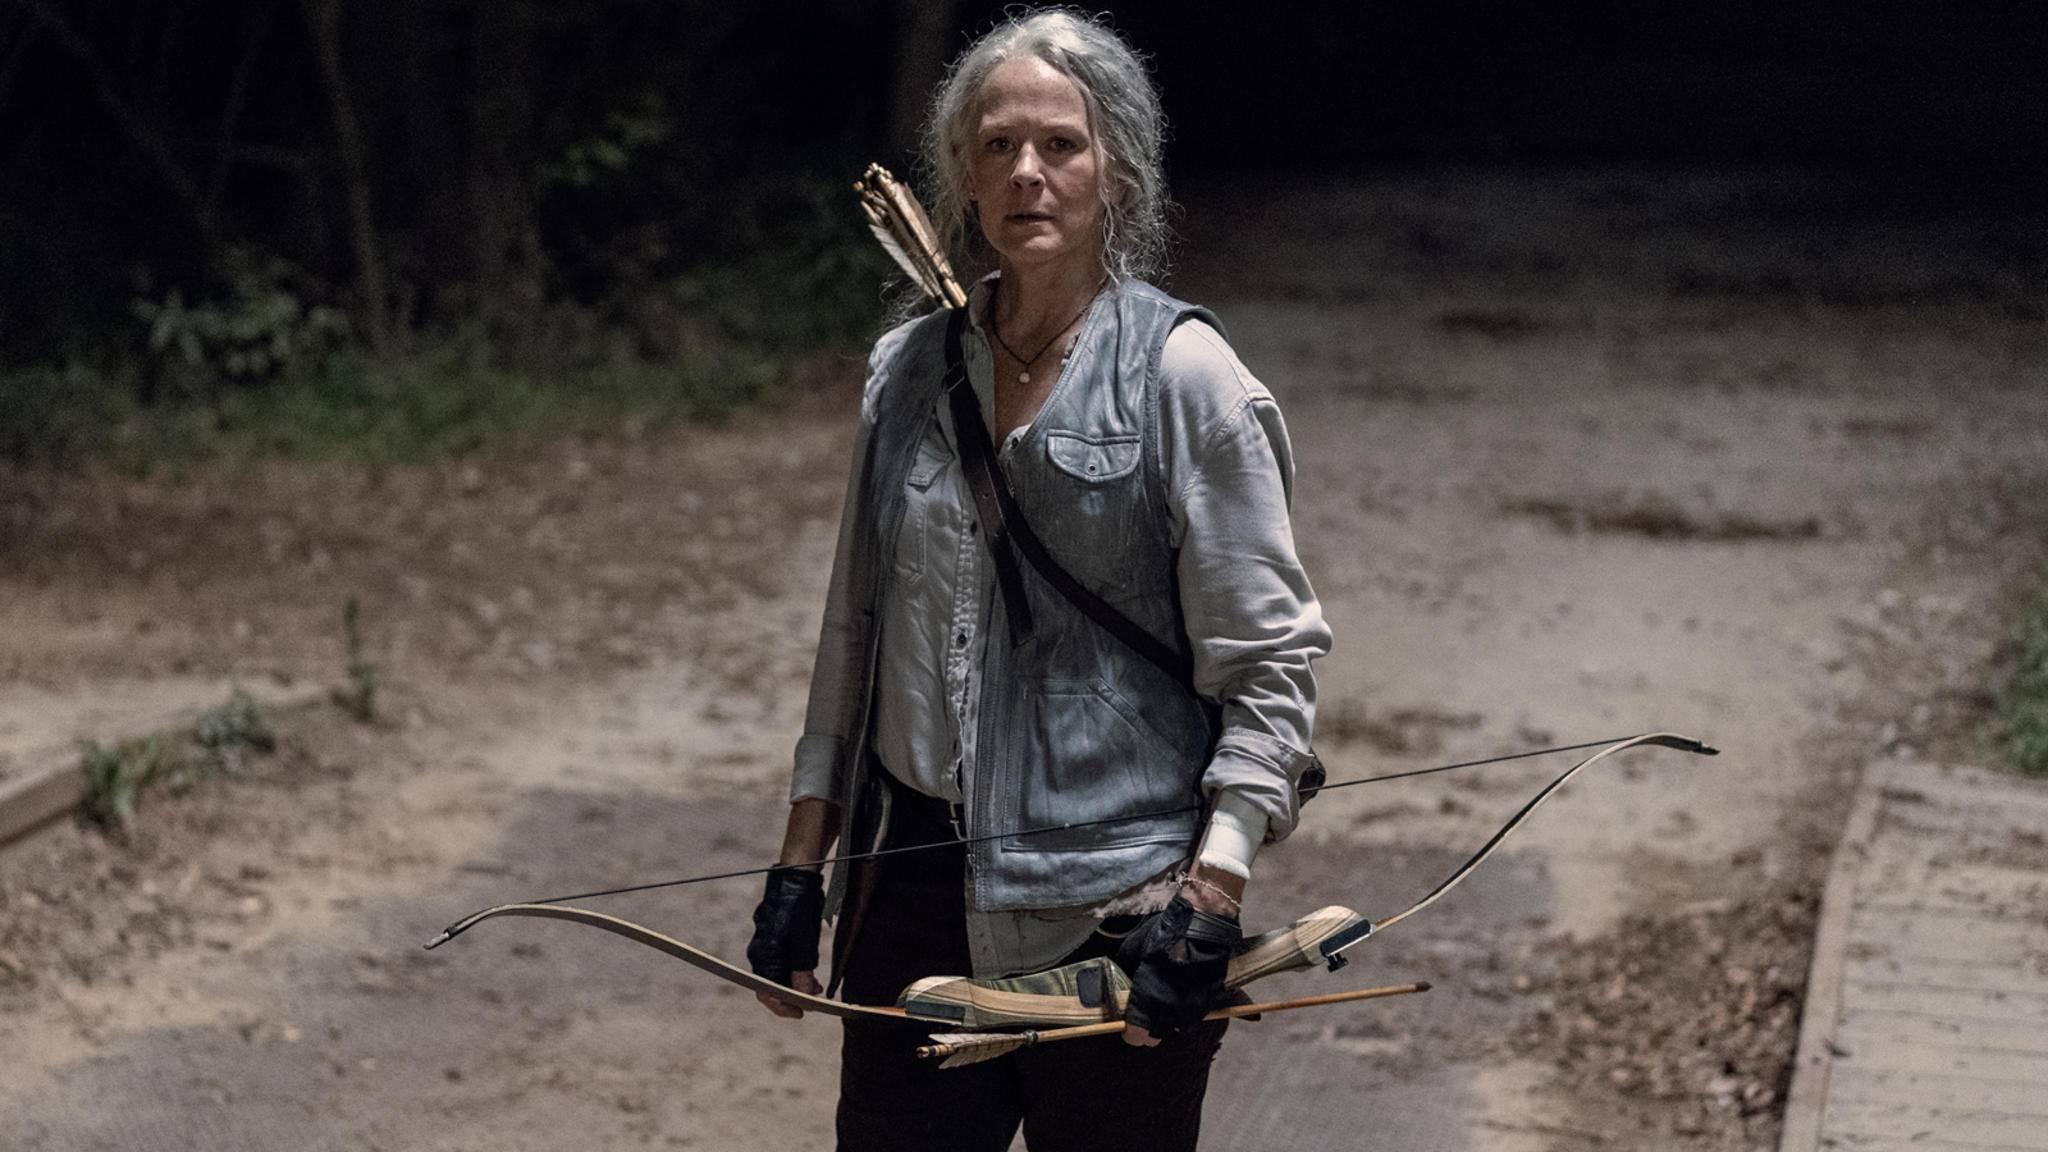 The Walking Dead-S10E07-Carol-Jace Downs-AMC-2